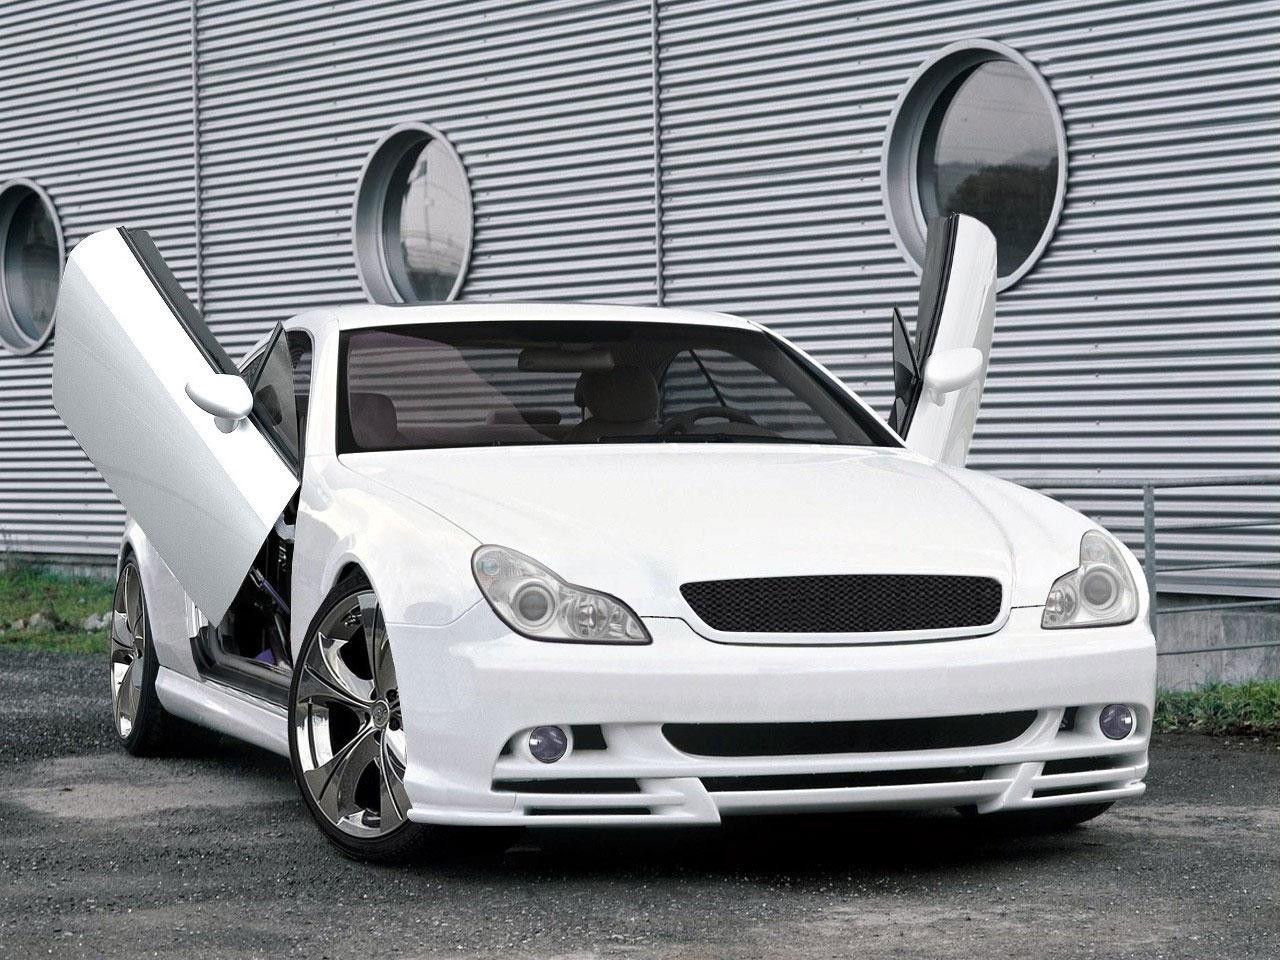 Modifikasi Mobil Tua Modifikasi Mobil Ceper Modifikasi